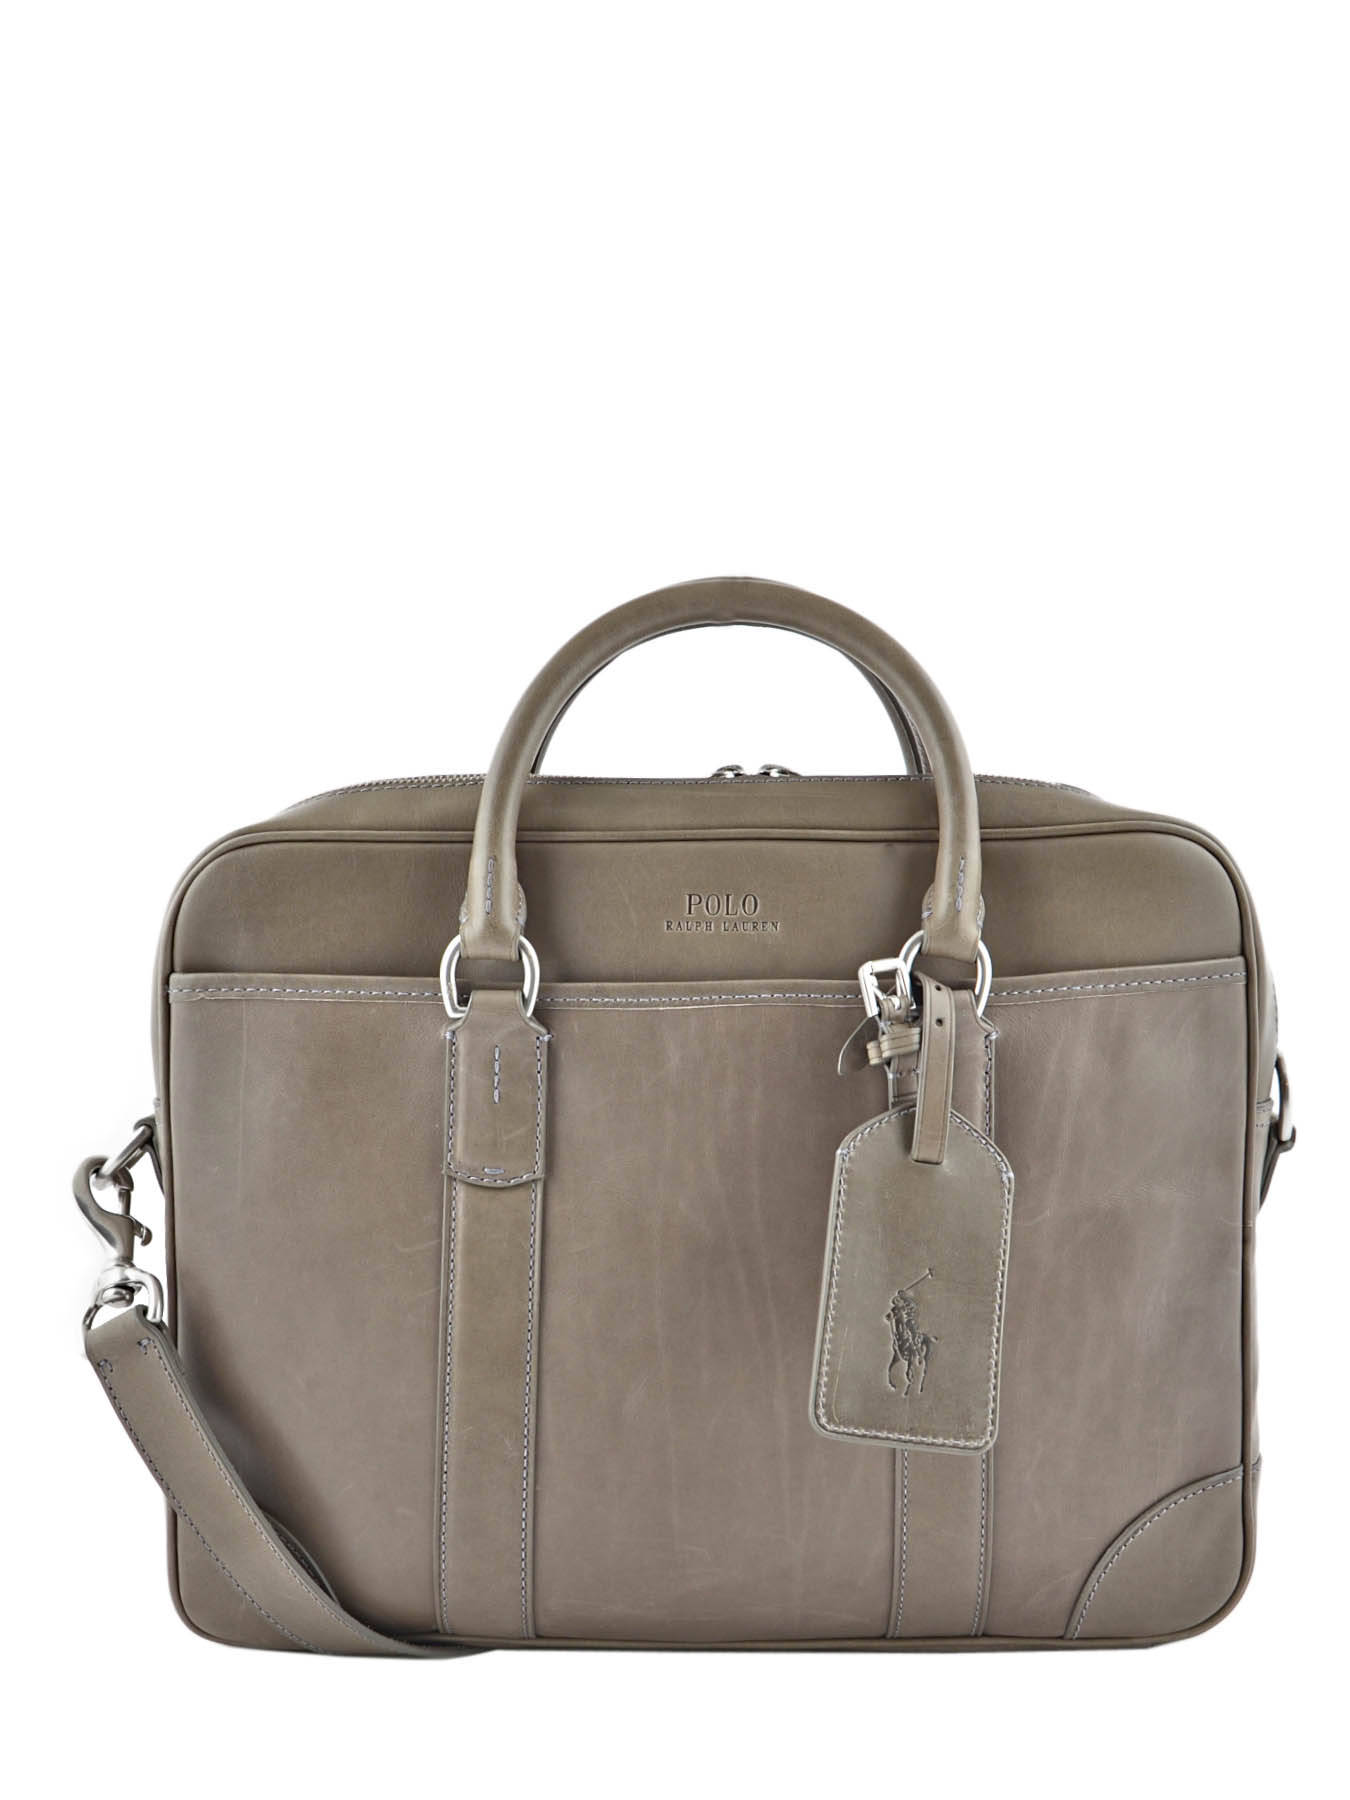 ... Briefcase Polo ralph lauren Gray leather commuter A92XZ6NI ...